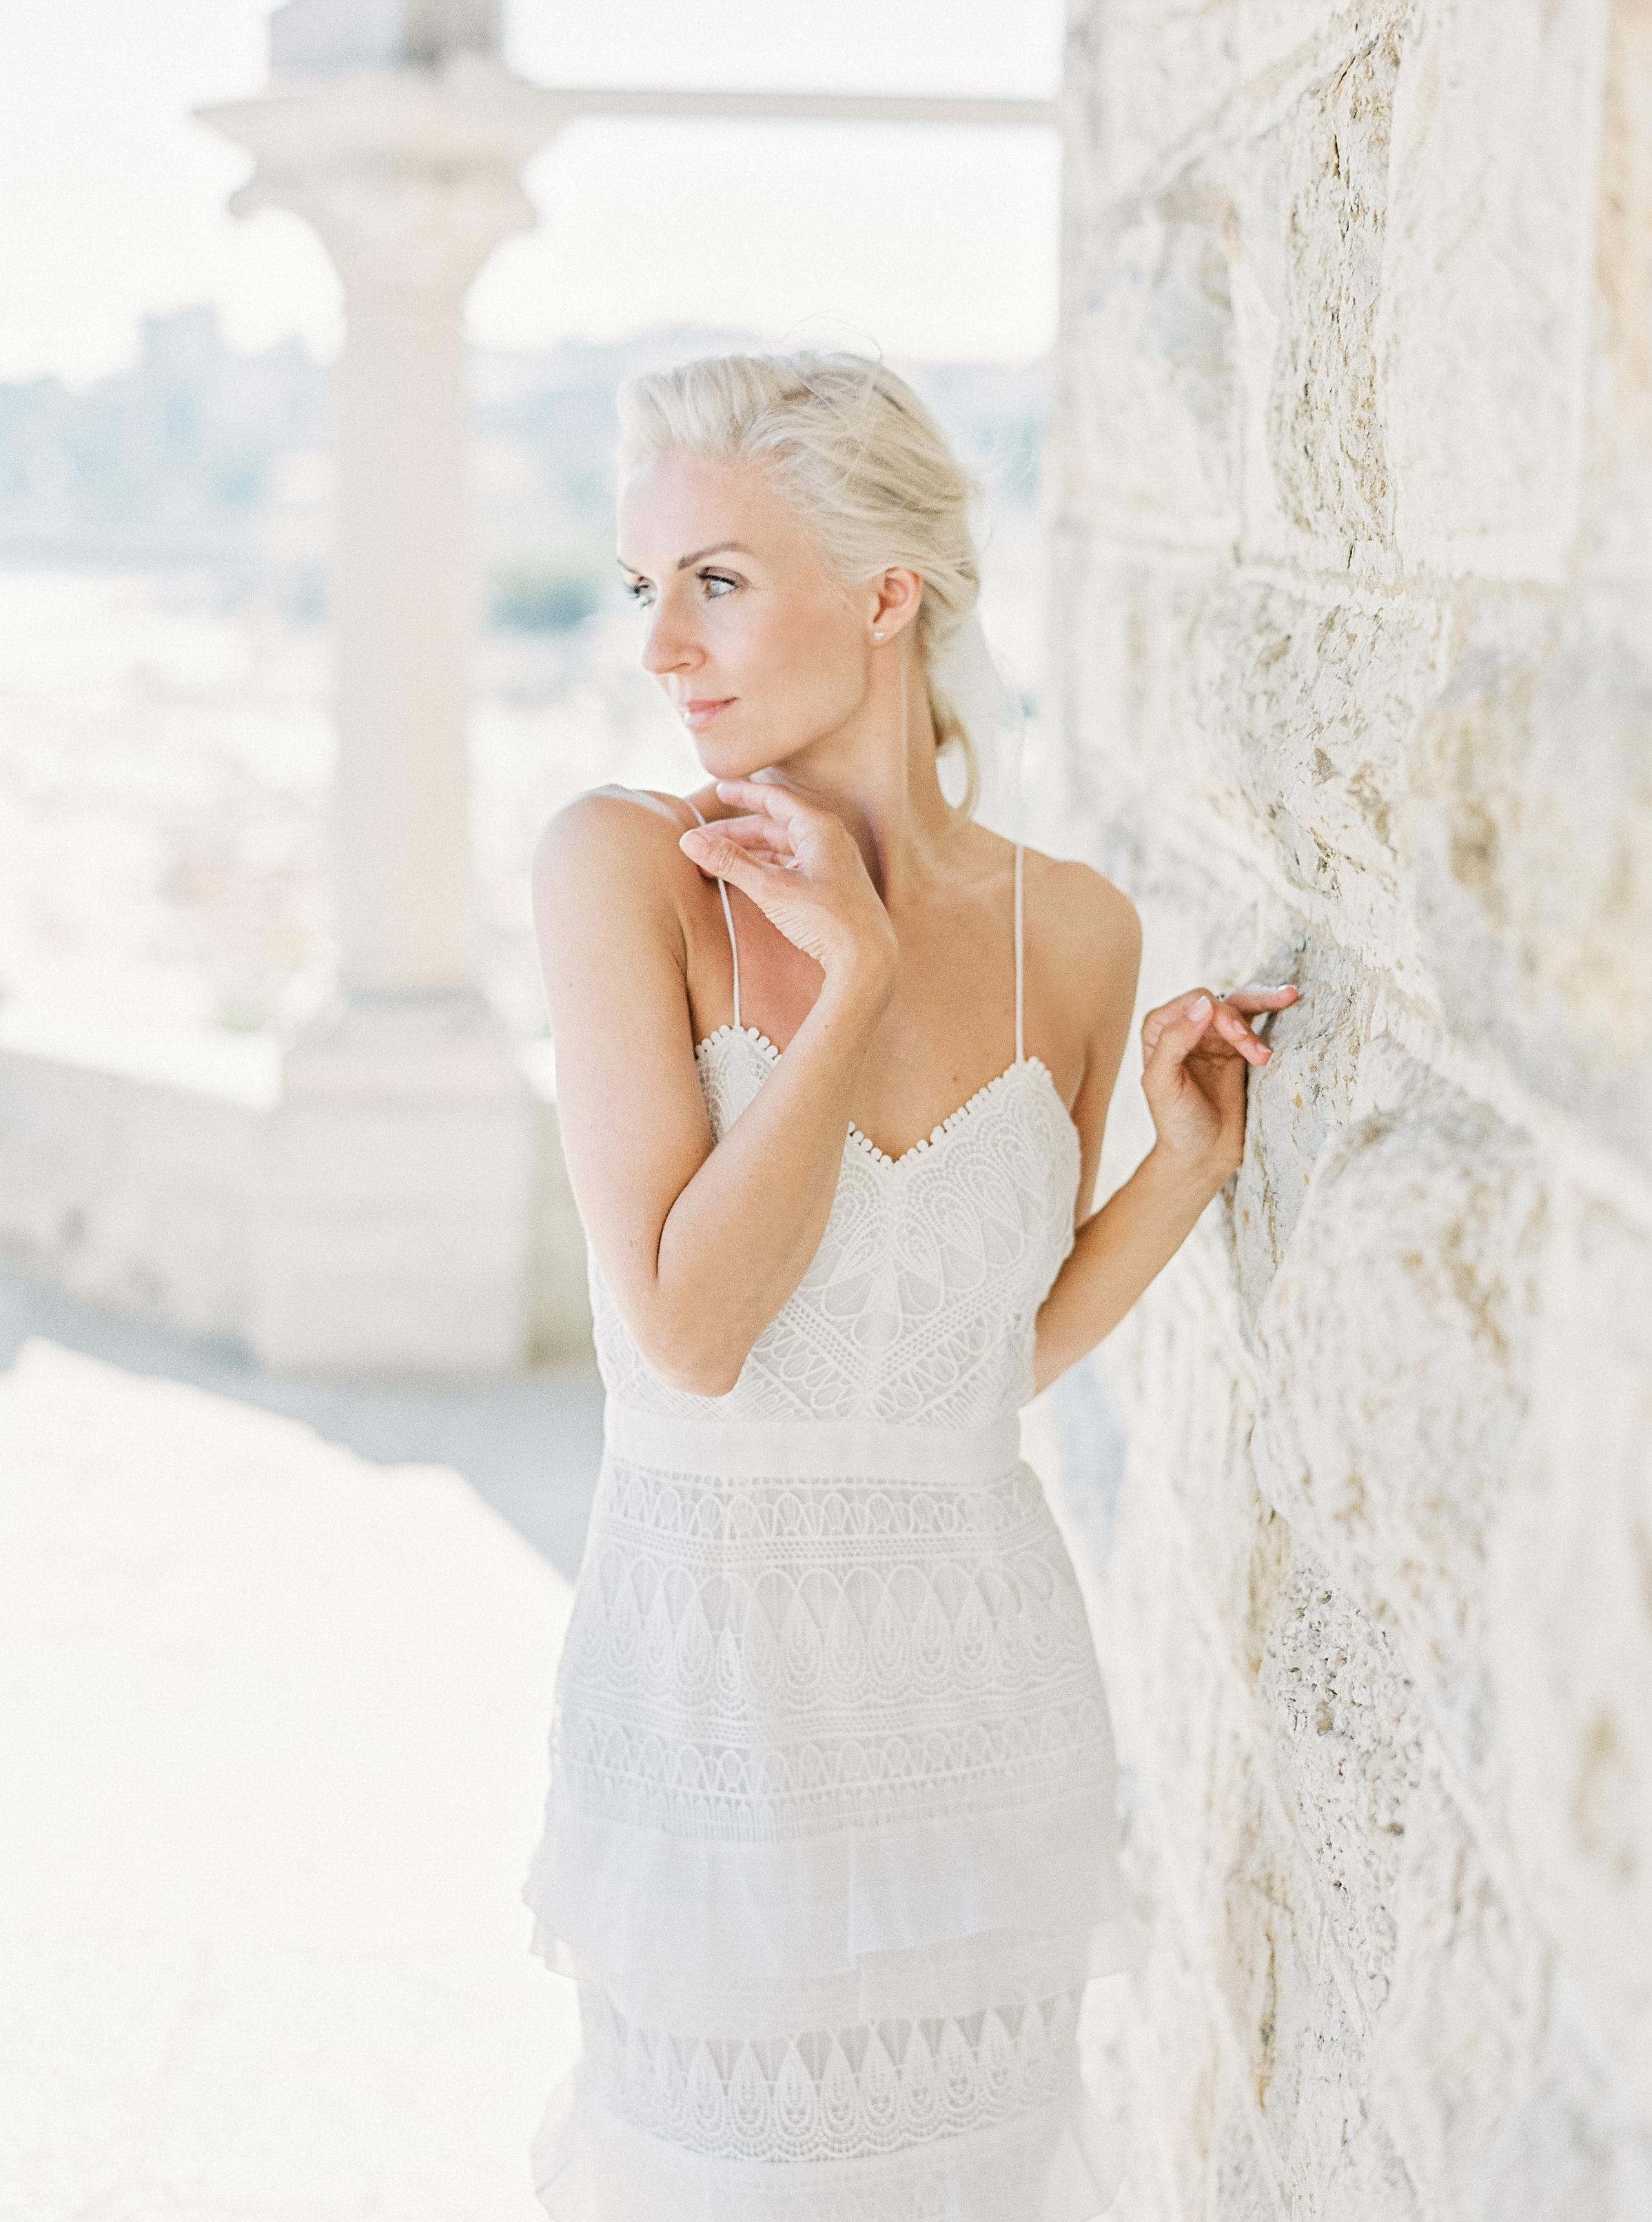 Nastia_Vesna_Photography_Wedding_Portugal_20.jpg